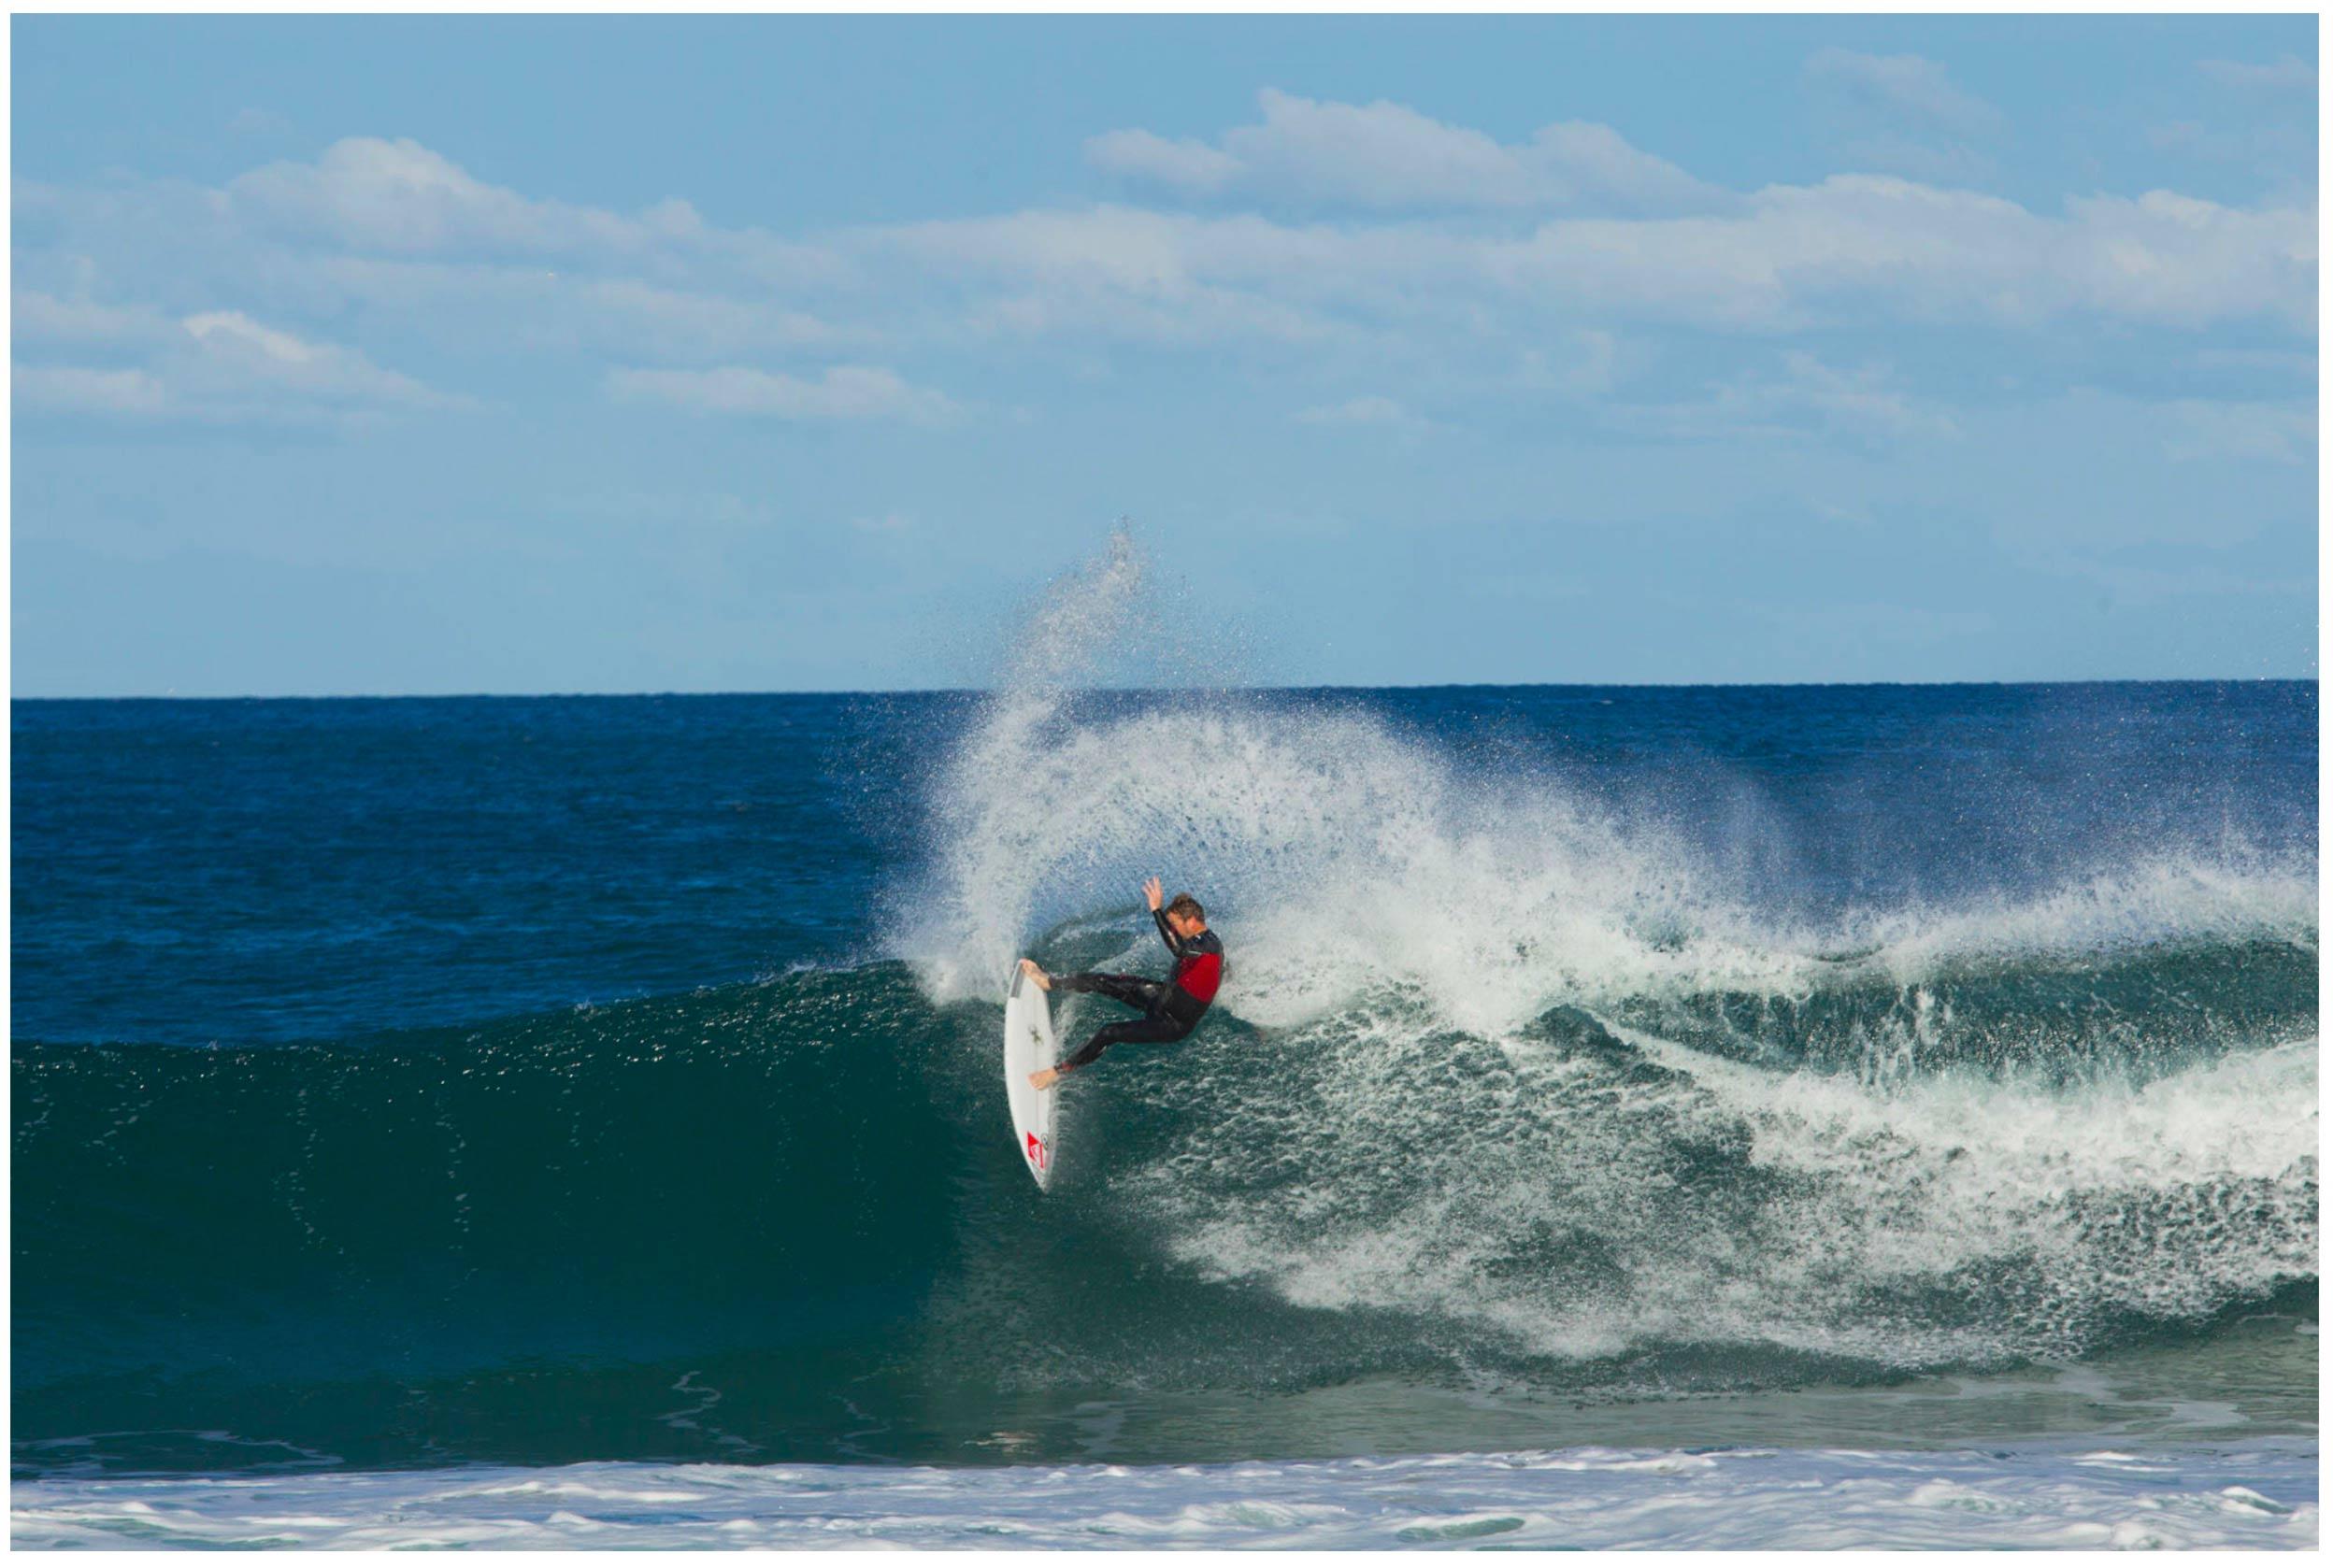 rodd-owen-surf-photography-for-sale-owenphoto-254.jpg